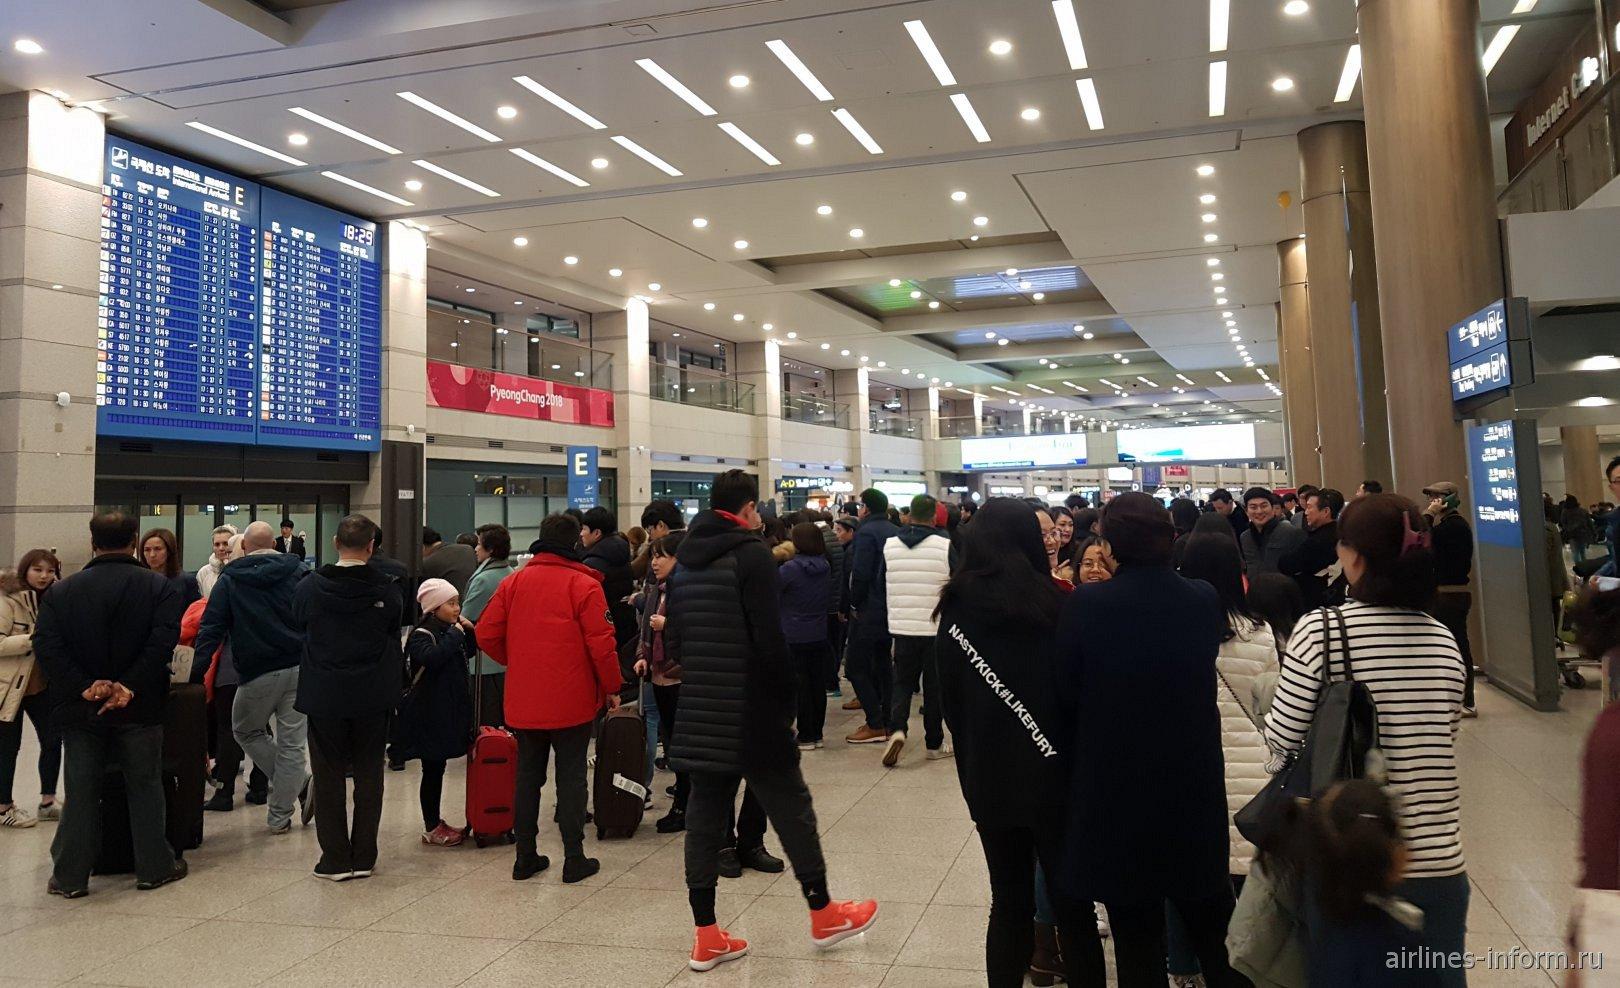 Зал прилета в аэропорту Сеул Инчхон